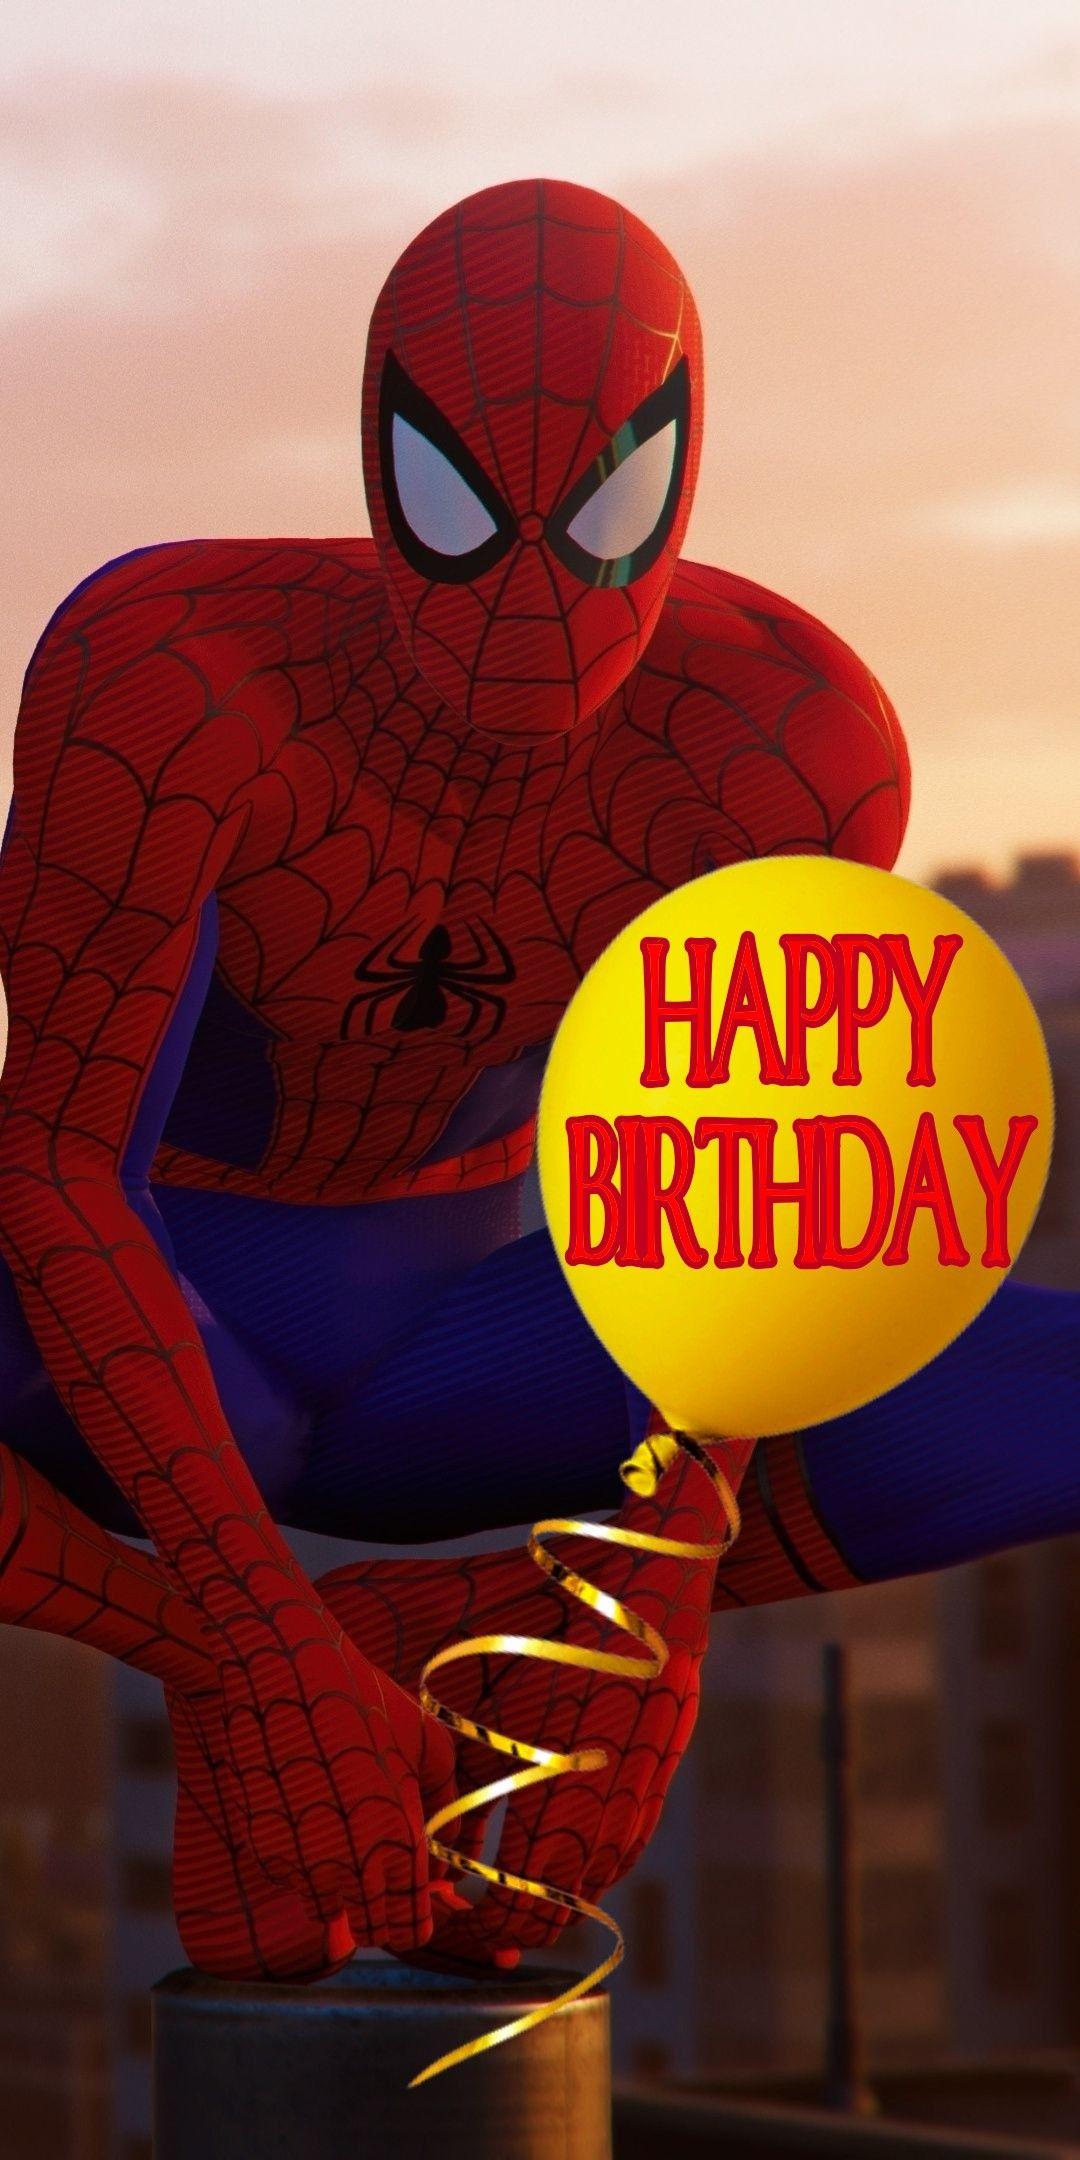 Happy Birthday Spiderman Happy Birthday Spiderman Birthday Wishes For Kids Spiderman Birthday